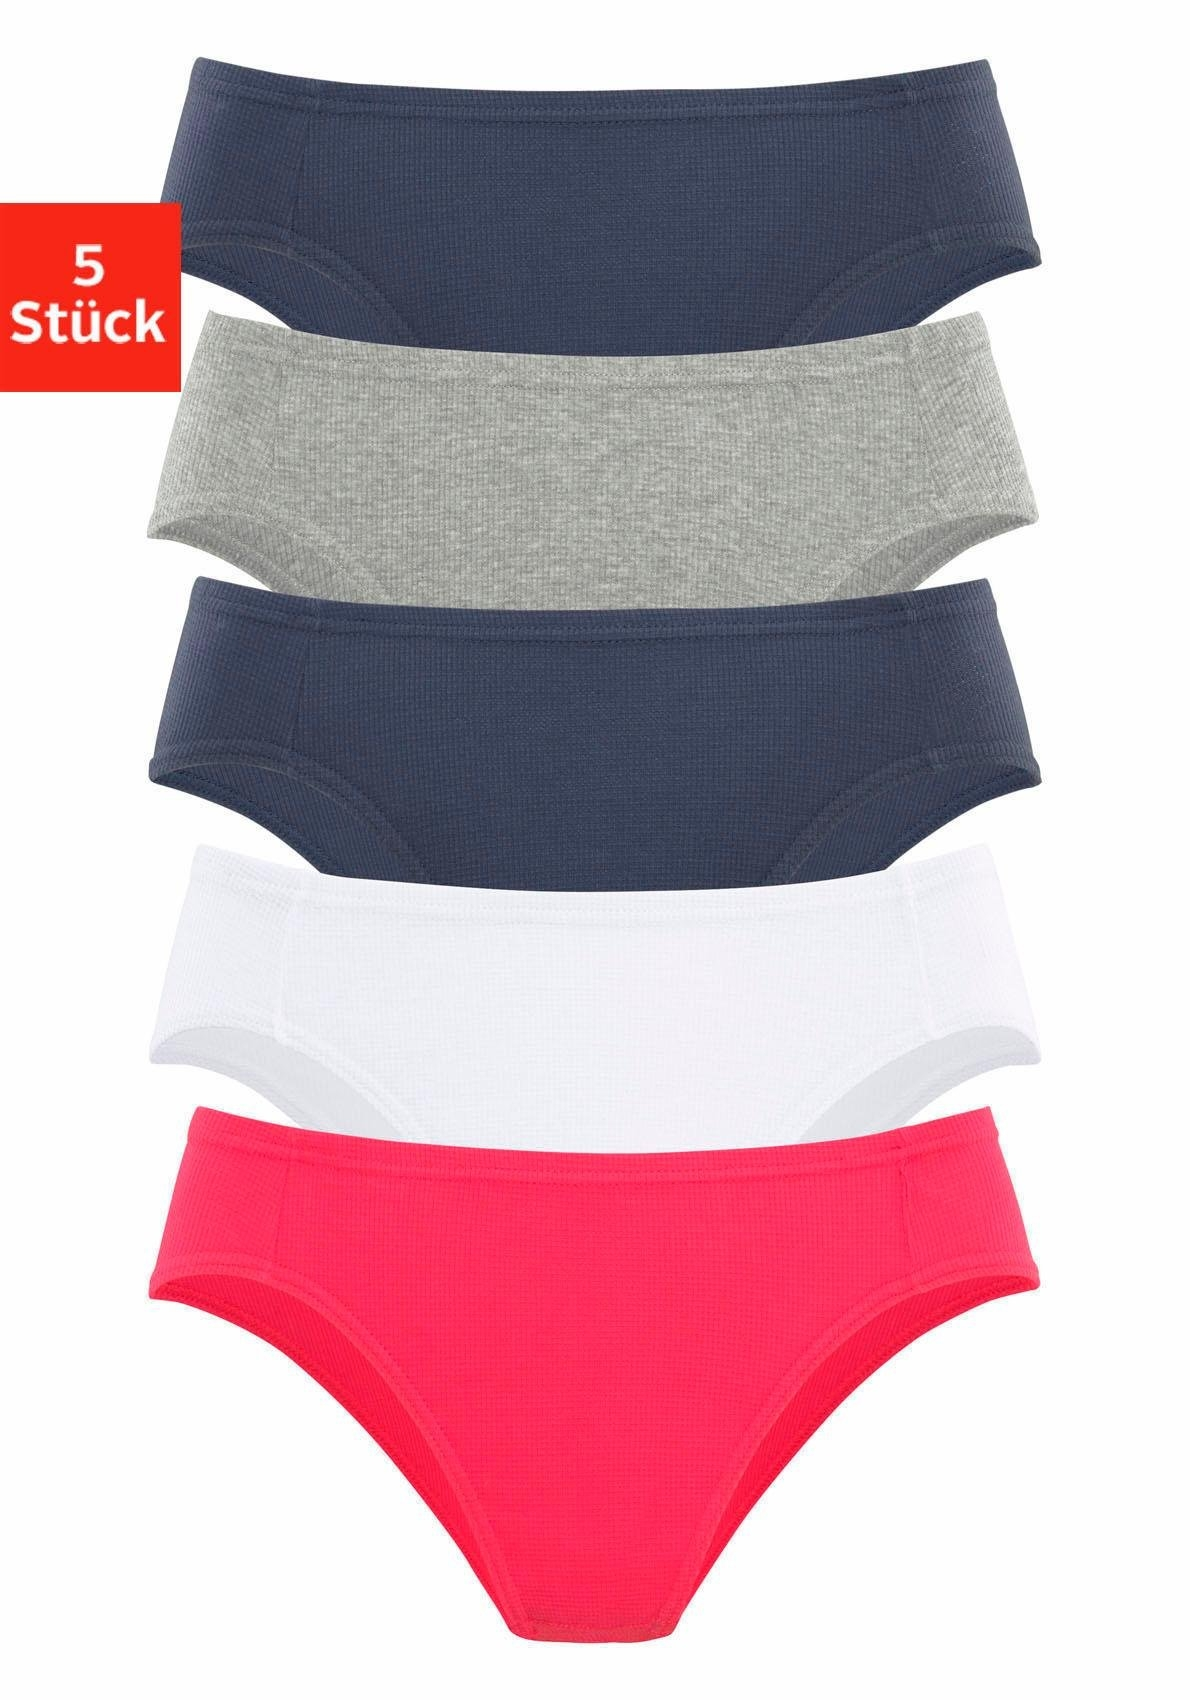 Petite Fleur Bikinislip, set van 5 bij Lascana online kopen